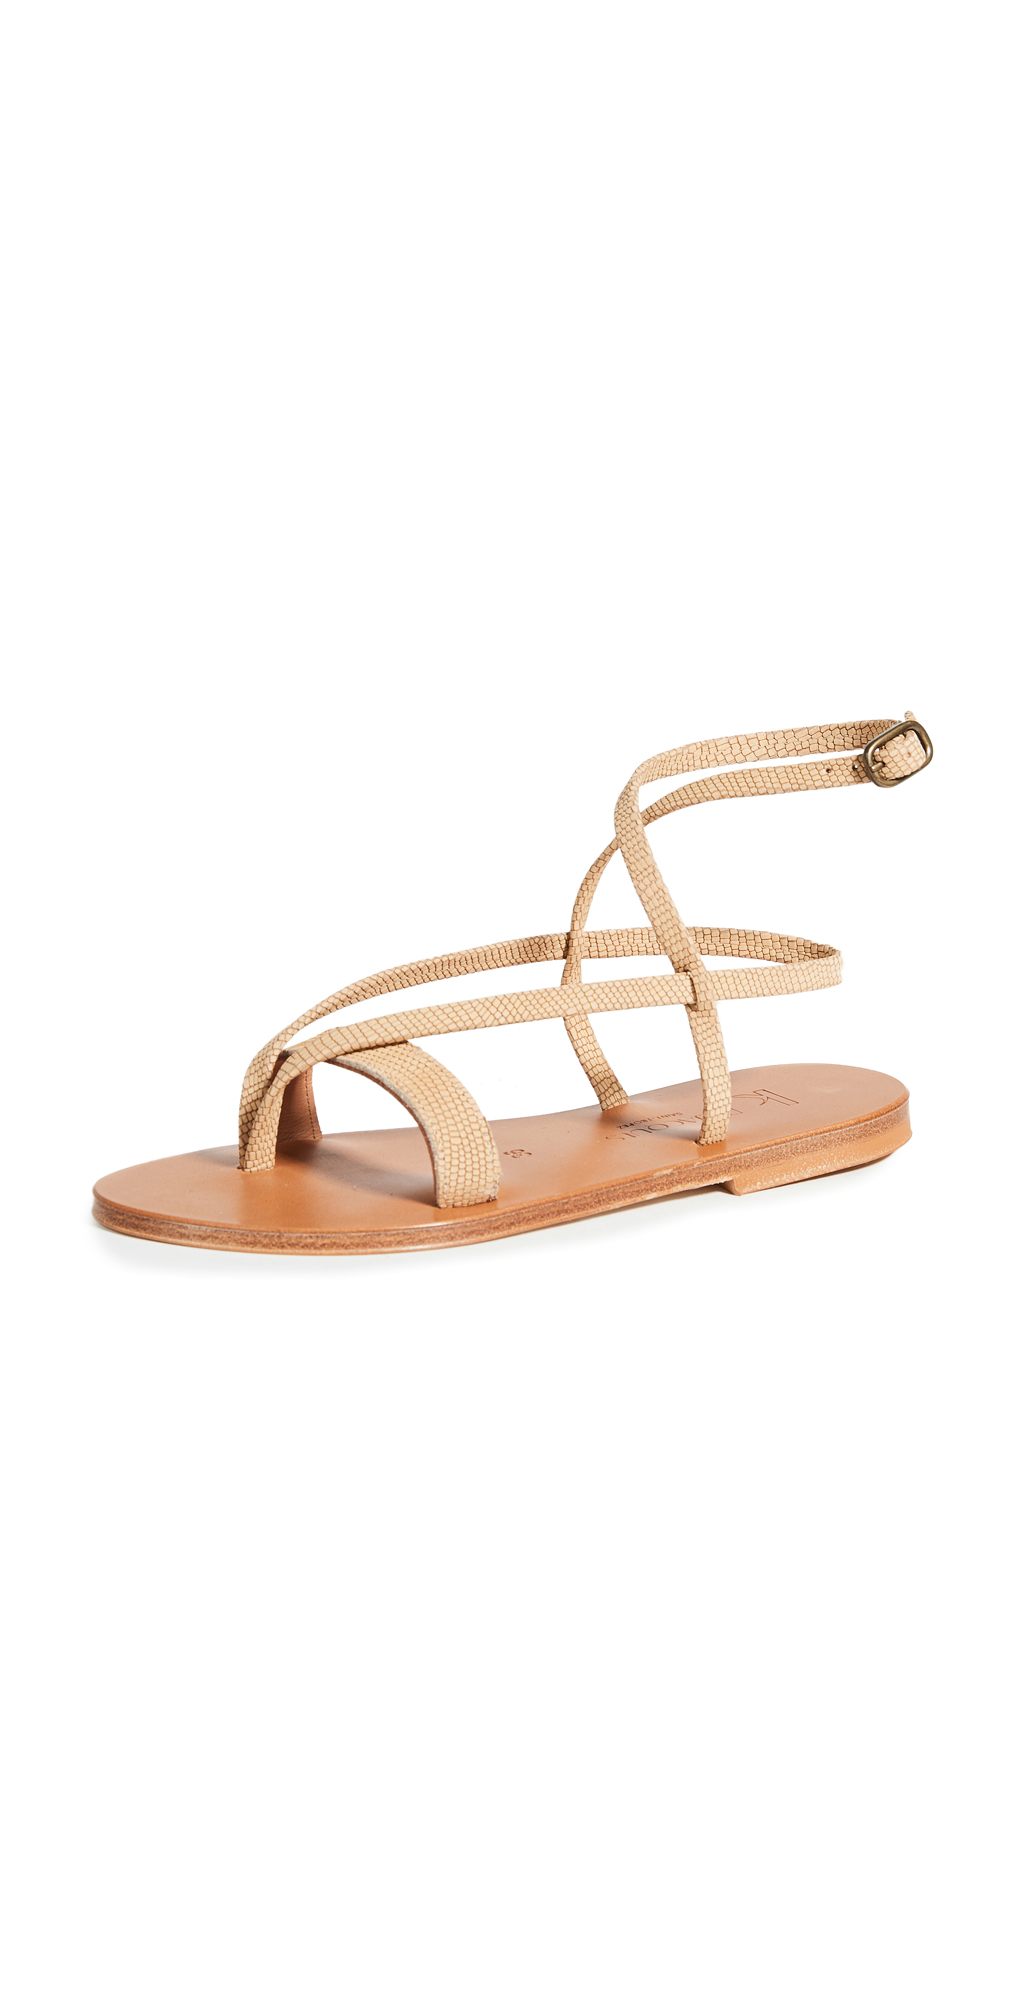 Maury Sandals